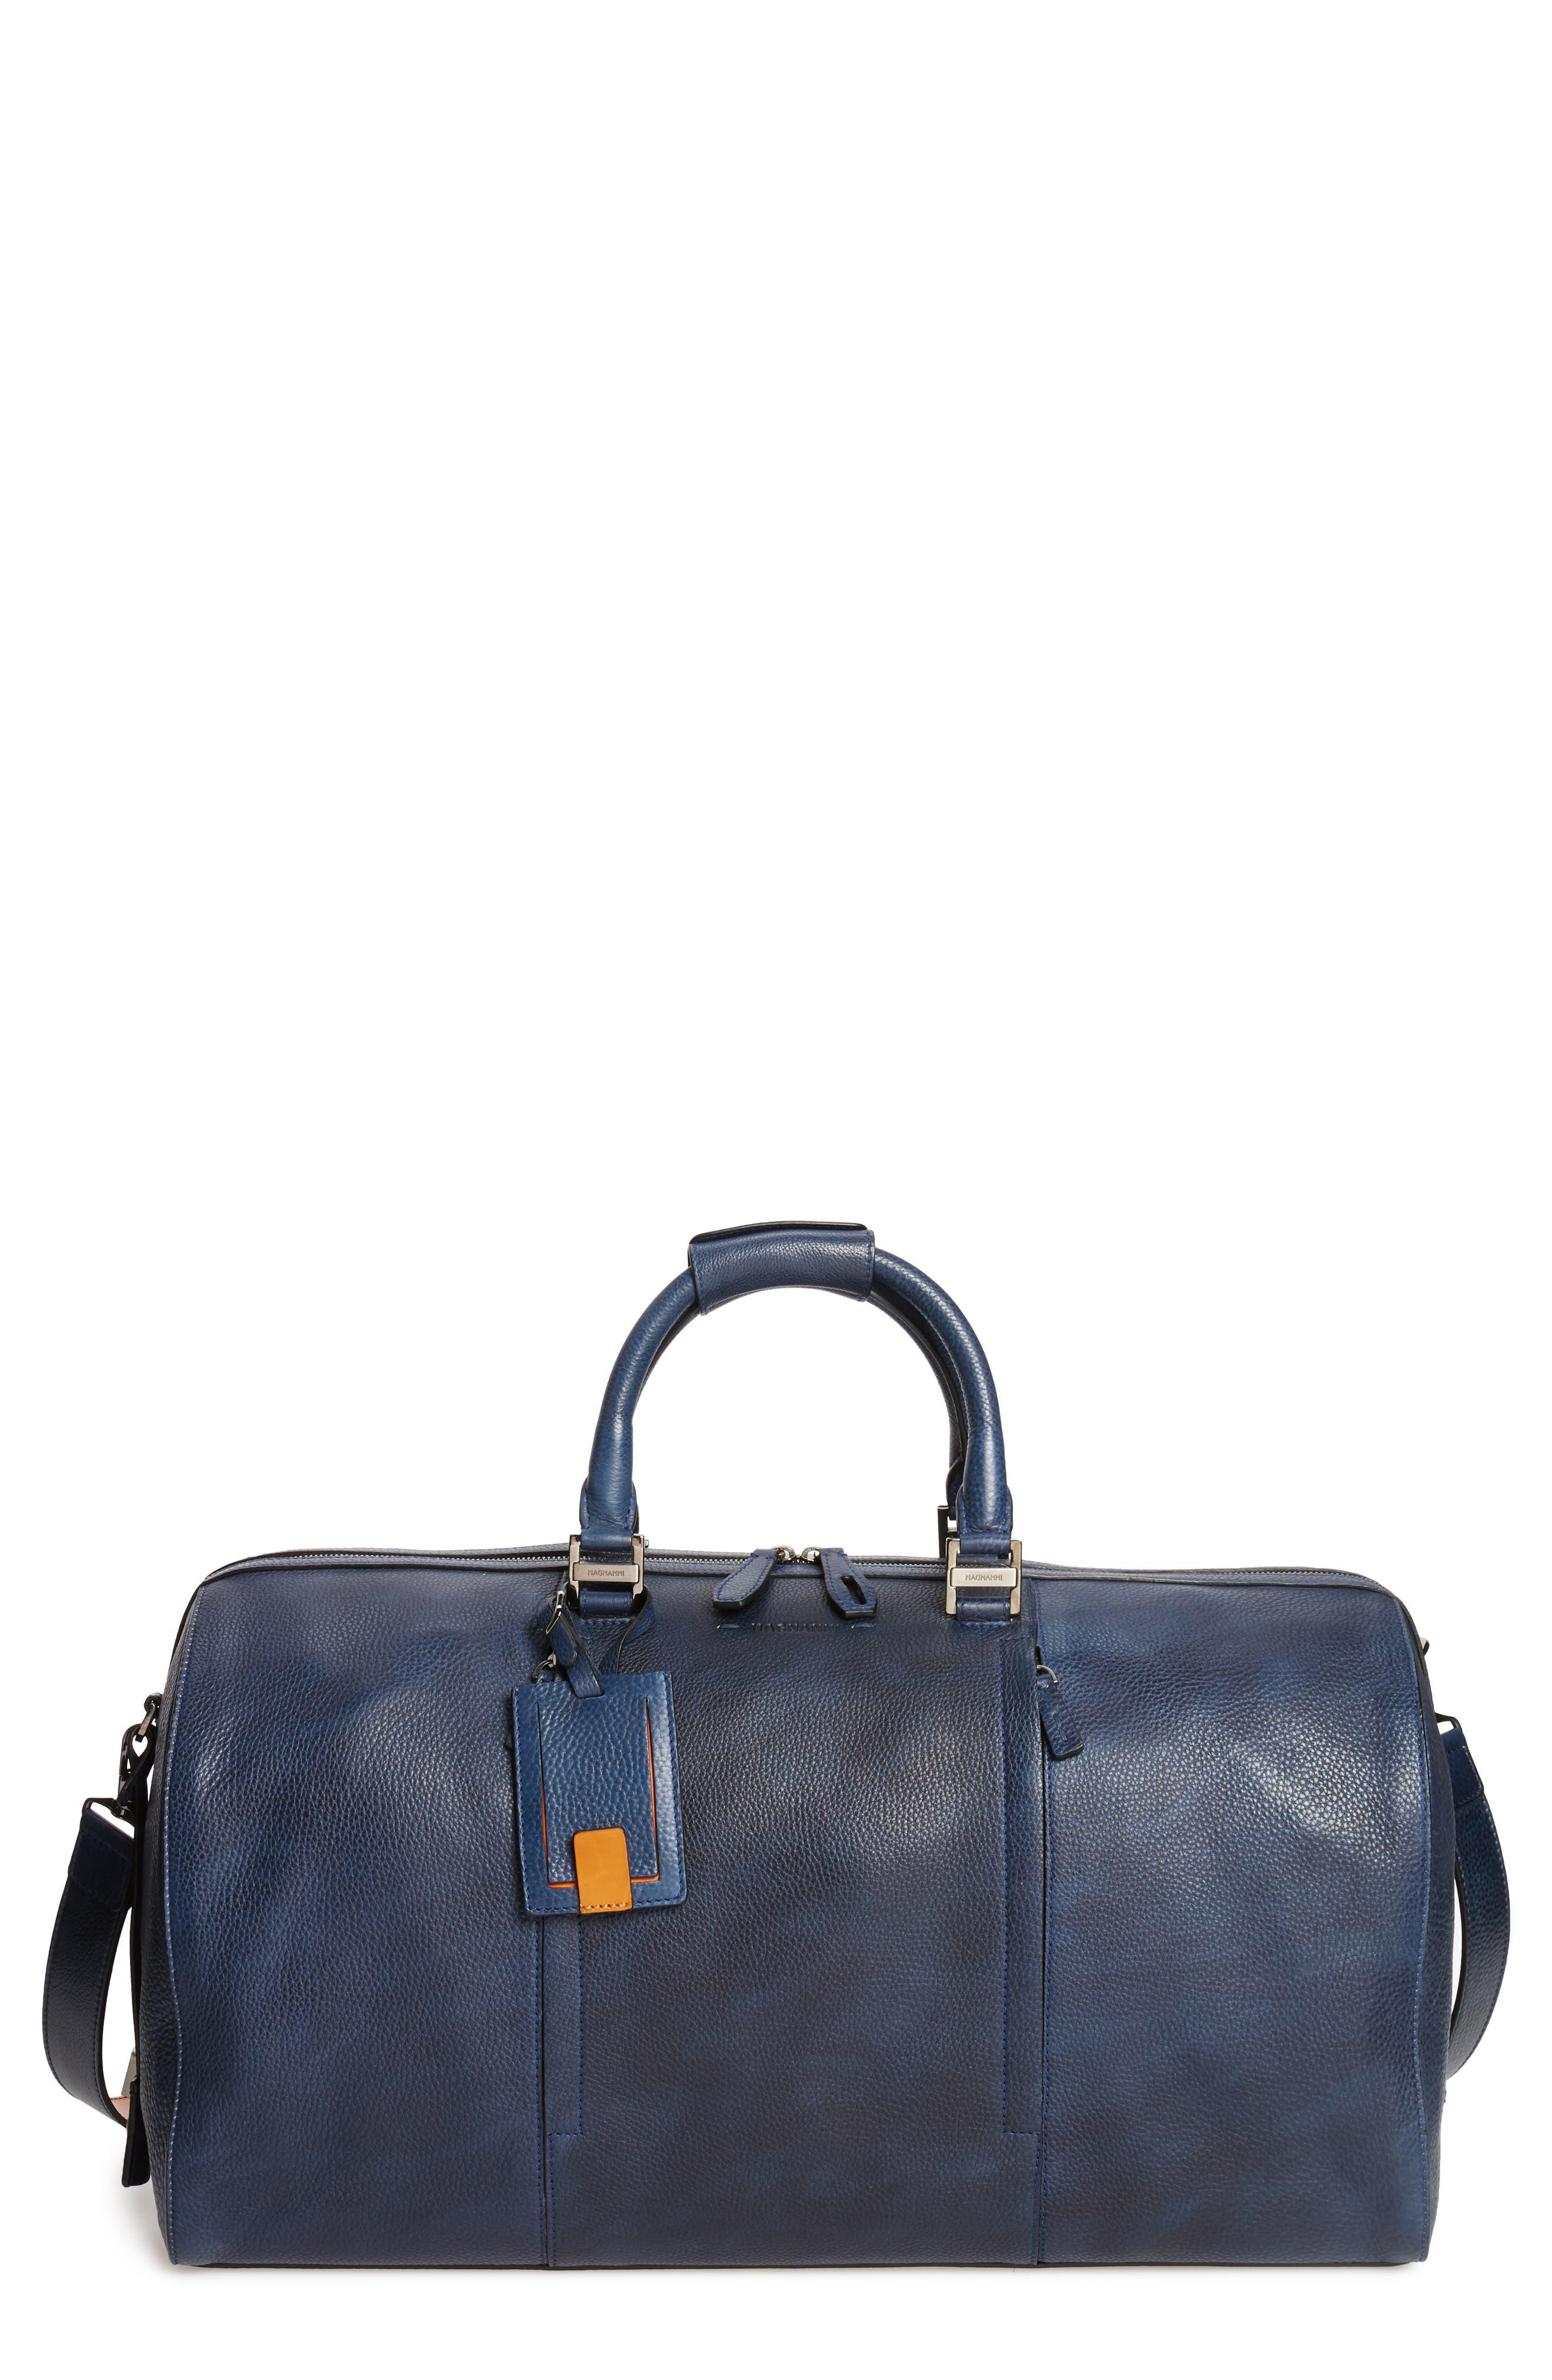 Traveler Leather Duffel Bag,                             Main thumbnail 4, color,